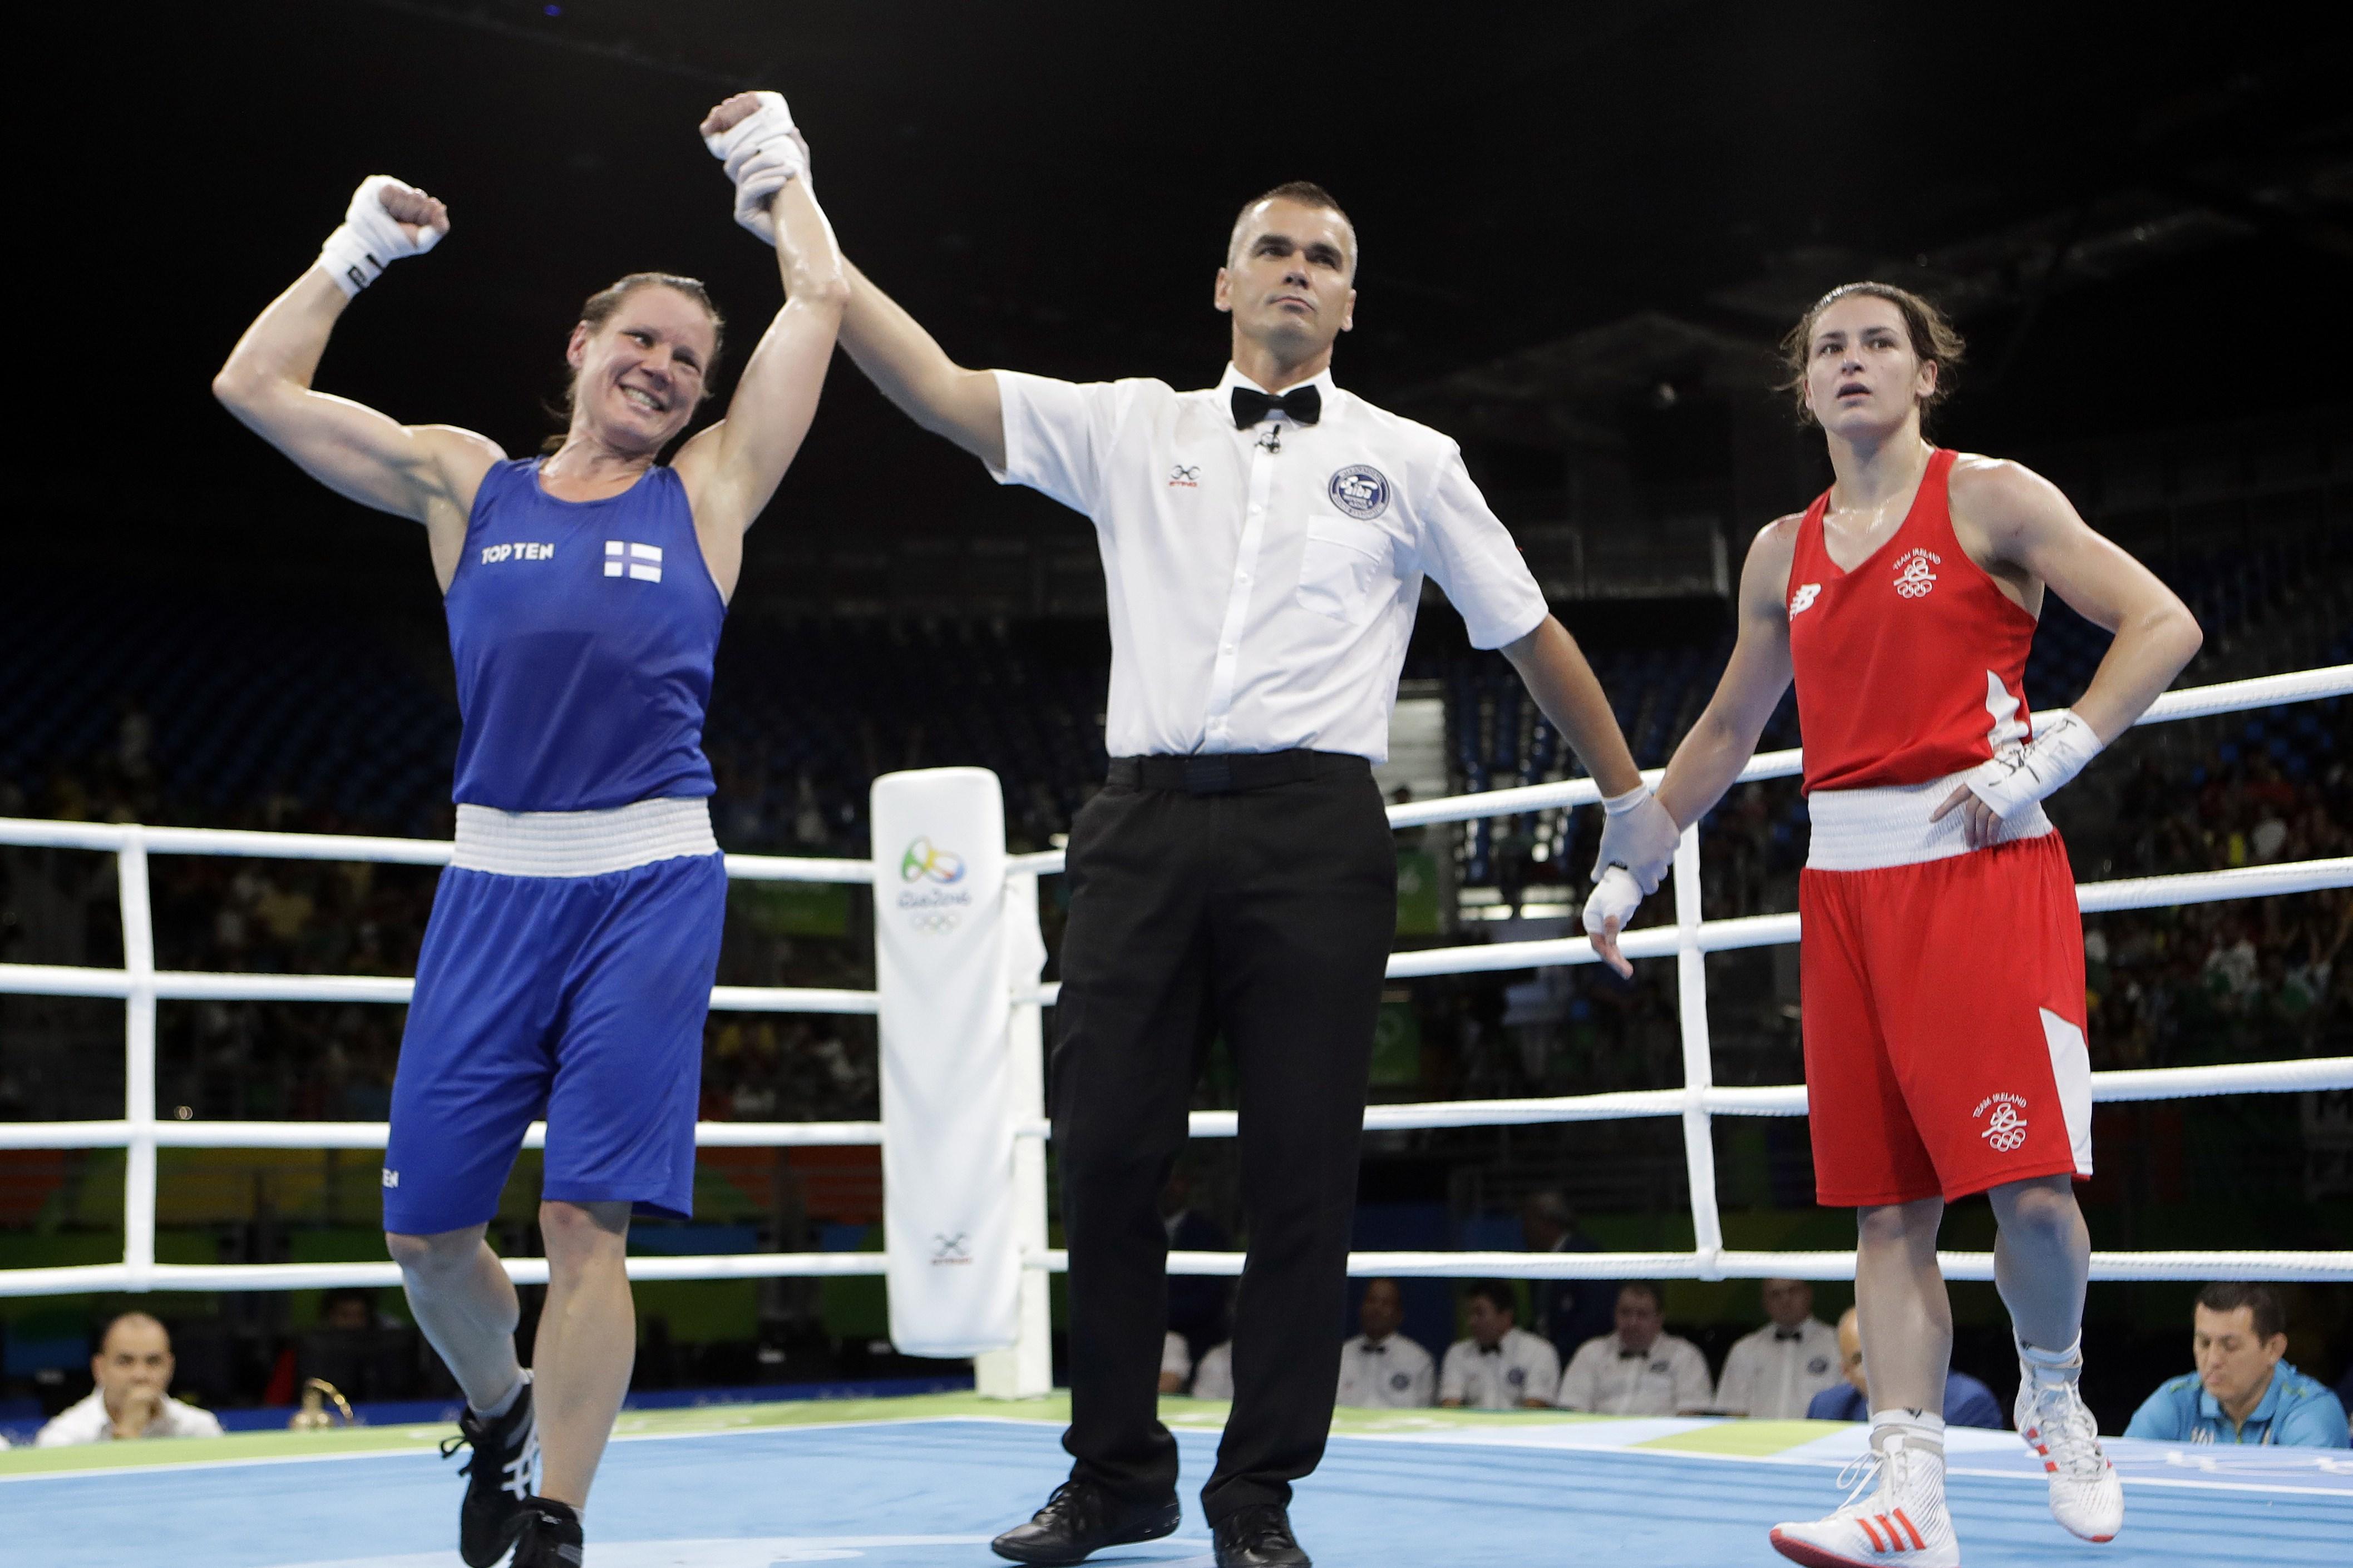 Finland's Mira Potkonen, left, reacts as she won a women's lightweight 60-kg quarterfinals boxing match against Ireland's Katie Taylor at the 2016 Summer Olympics in Rio de Janeiro, Brazil, Monday, Aug. 15, 2016. (AP Photo/Frank Franklin II)